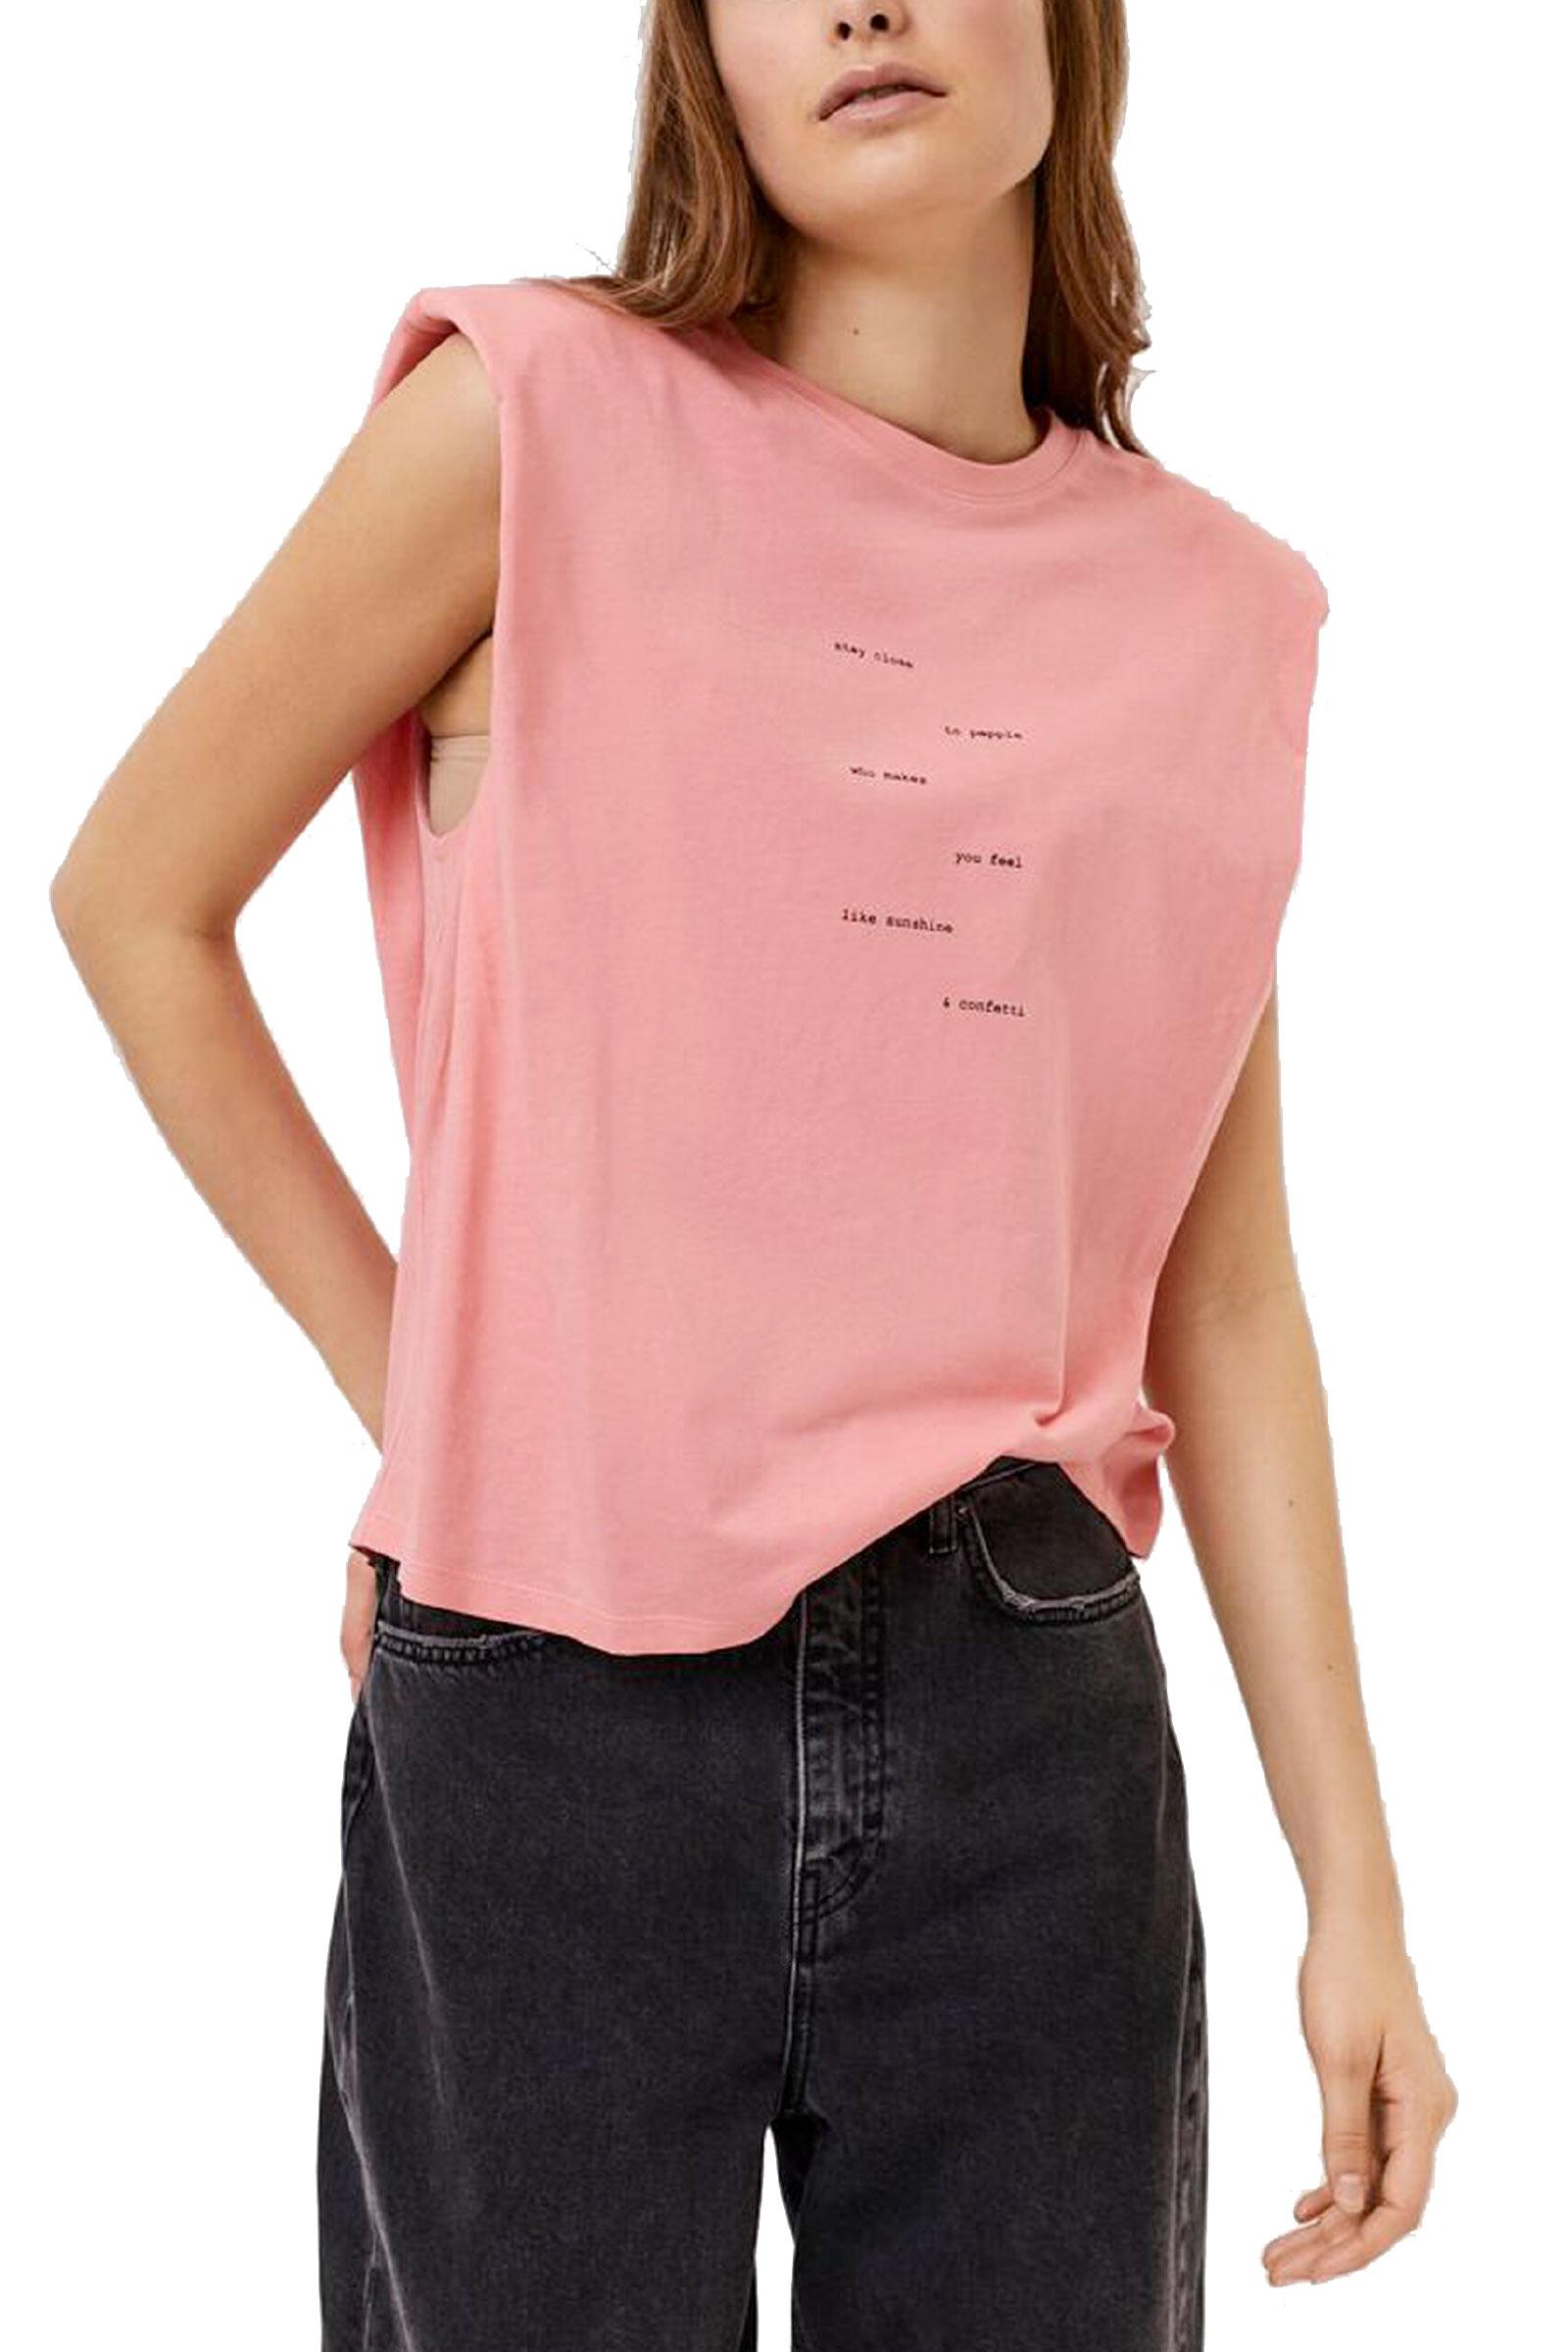 VERO MODA T-SHIRT Donna Modello HOLLIE VERO MODA   T-Shirt   10245256Print-TEXT FROMS IDE TO SIDE